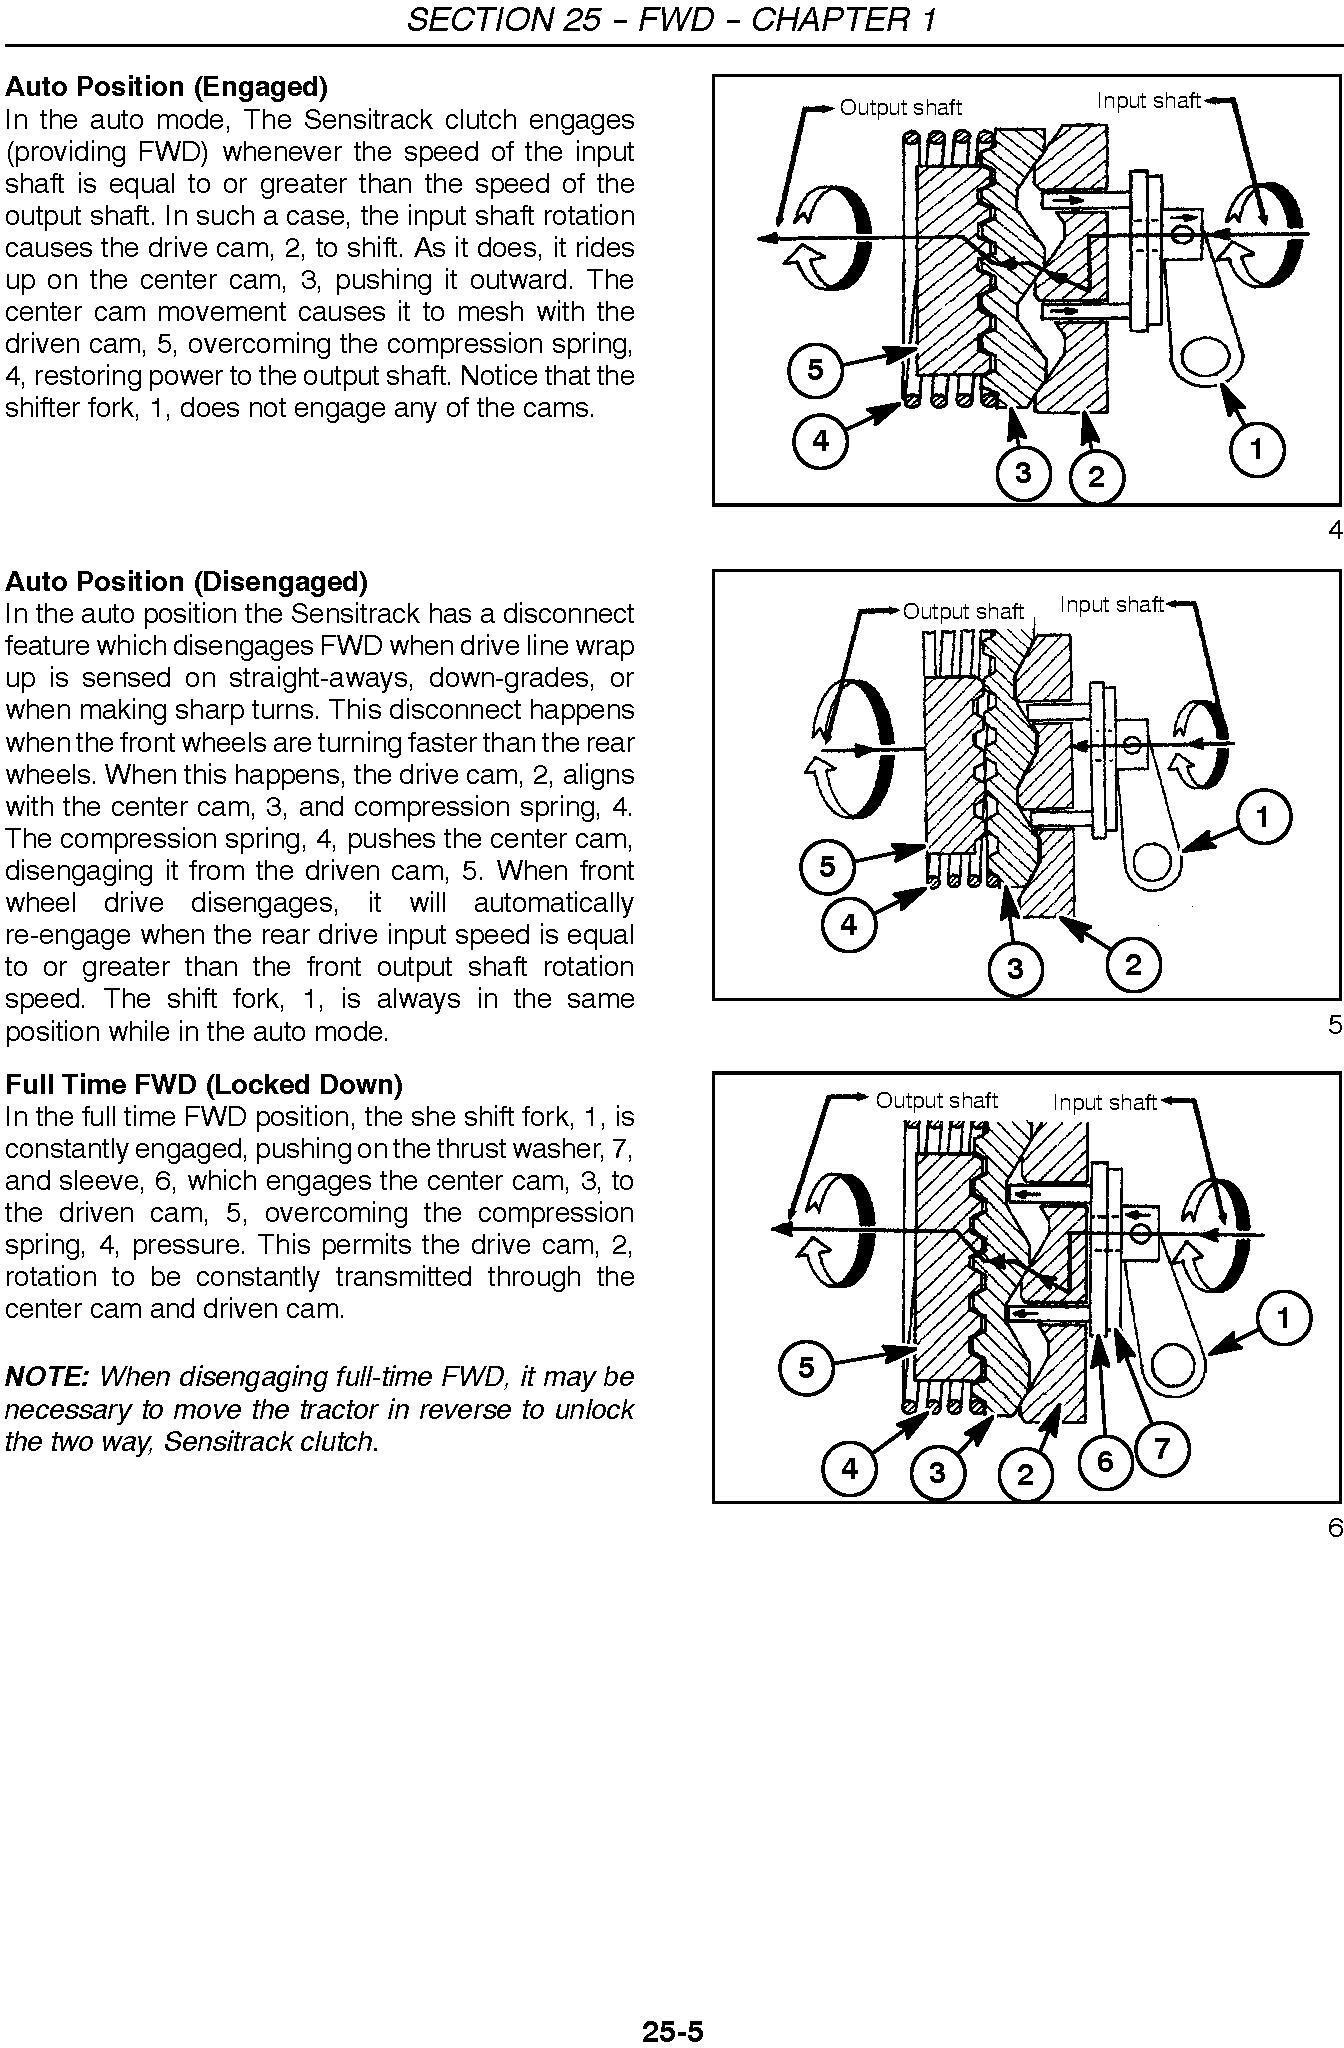 New Holland TZ18DA, TZ22DA, TZ24DA, TZ25DA Compact Tractor Complete Service Manual - 1